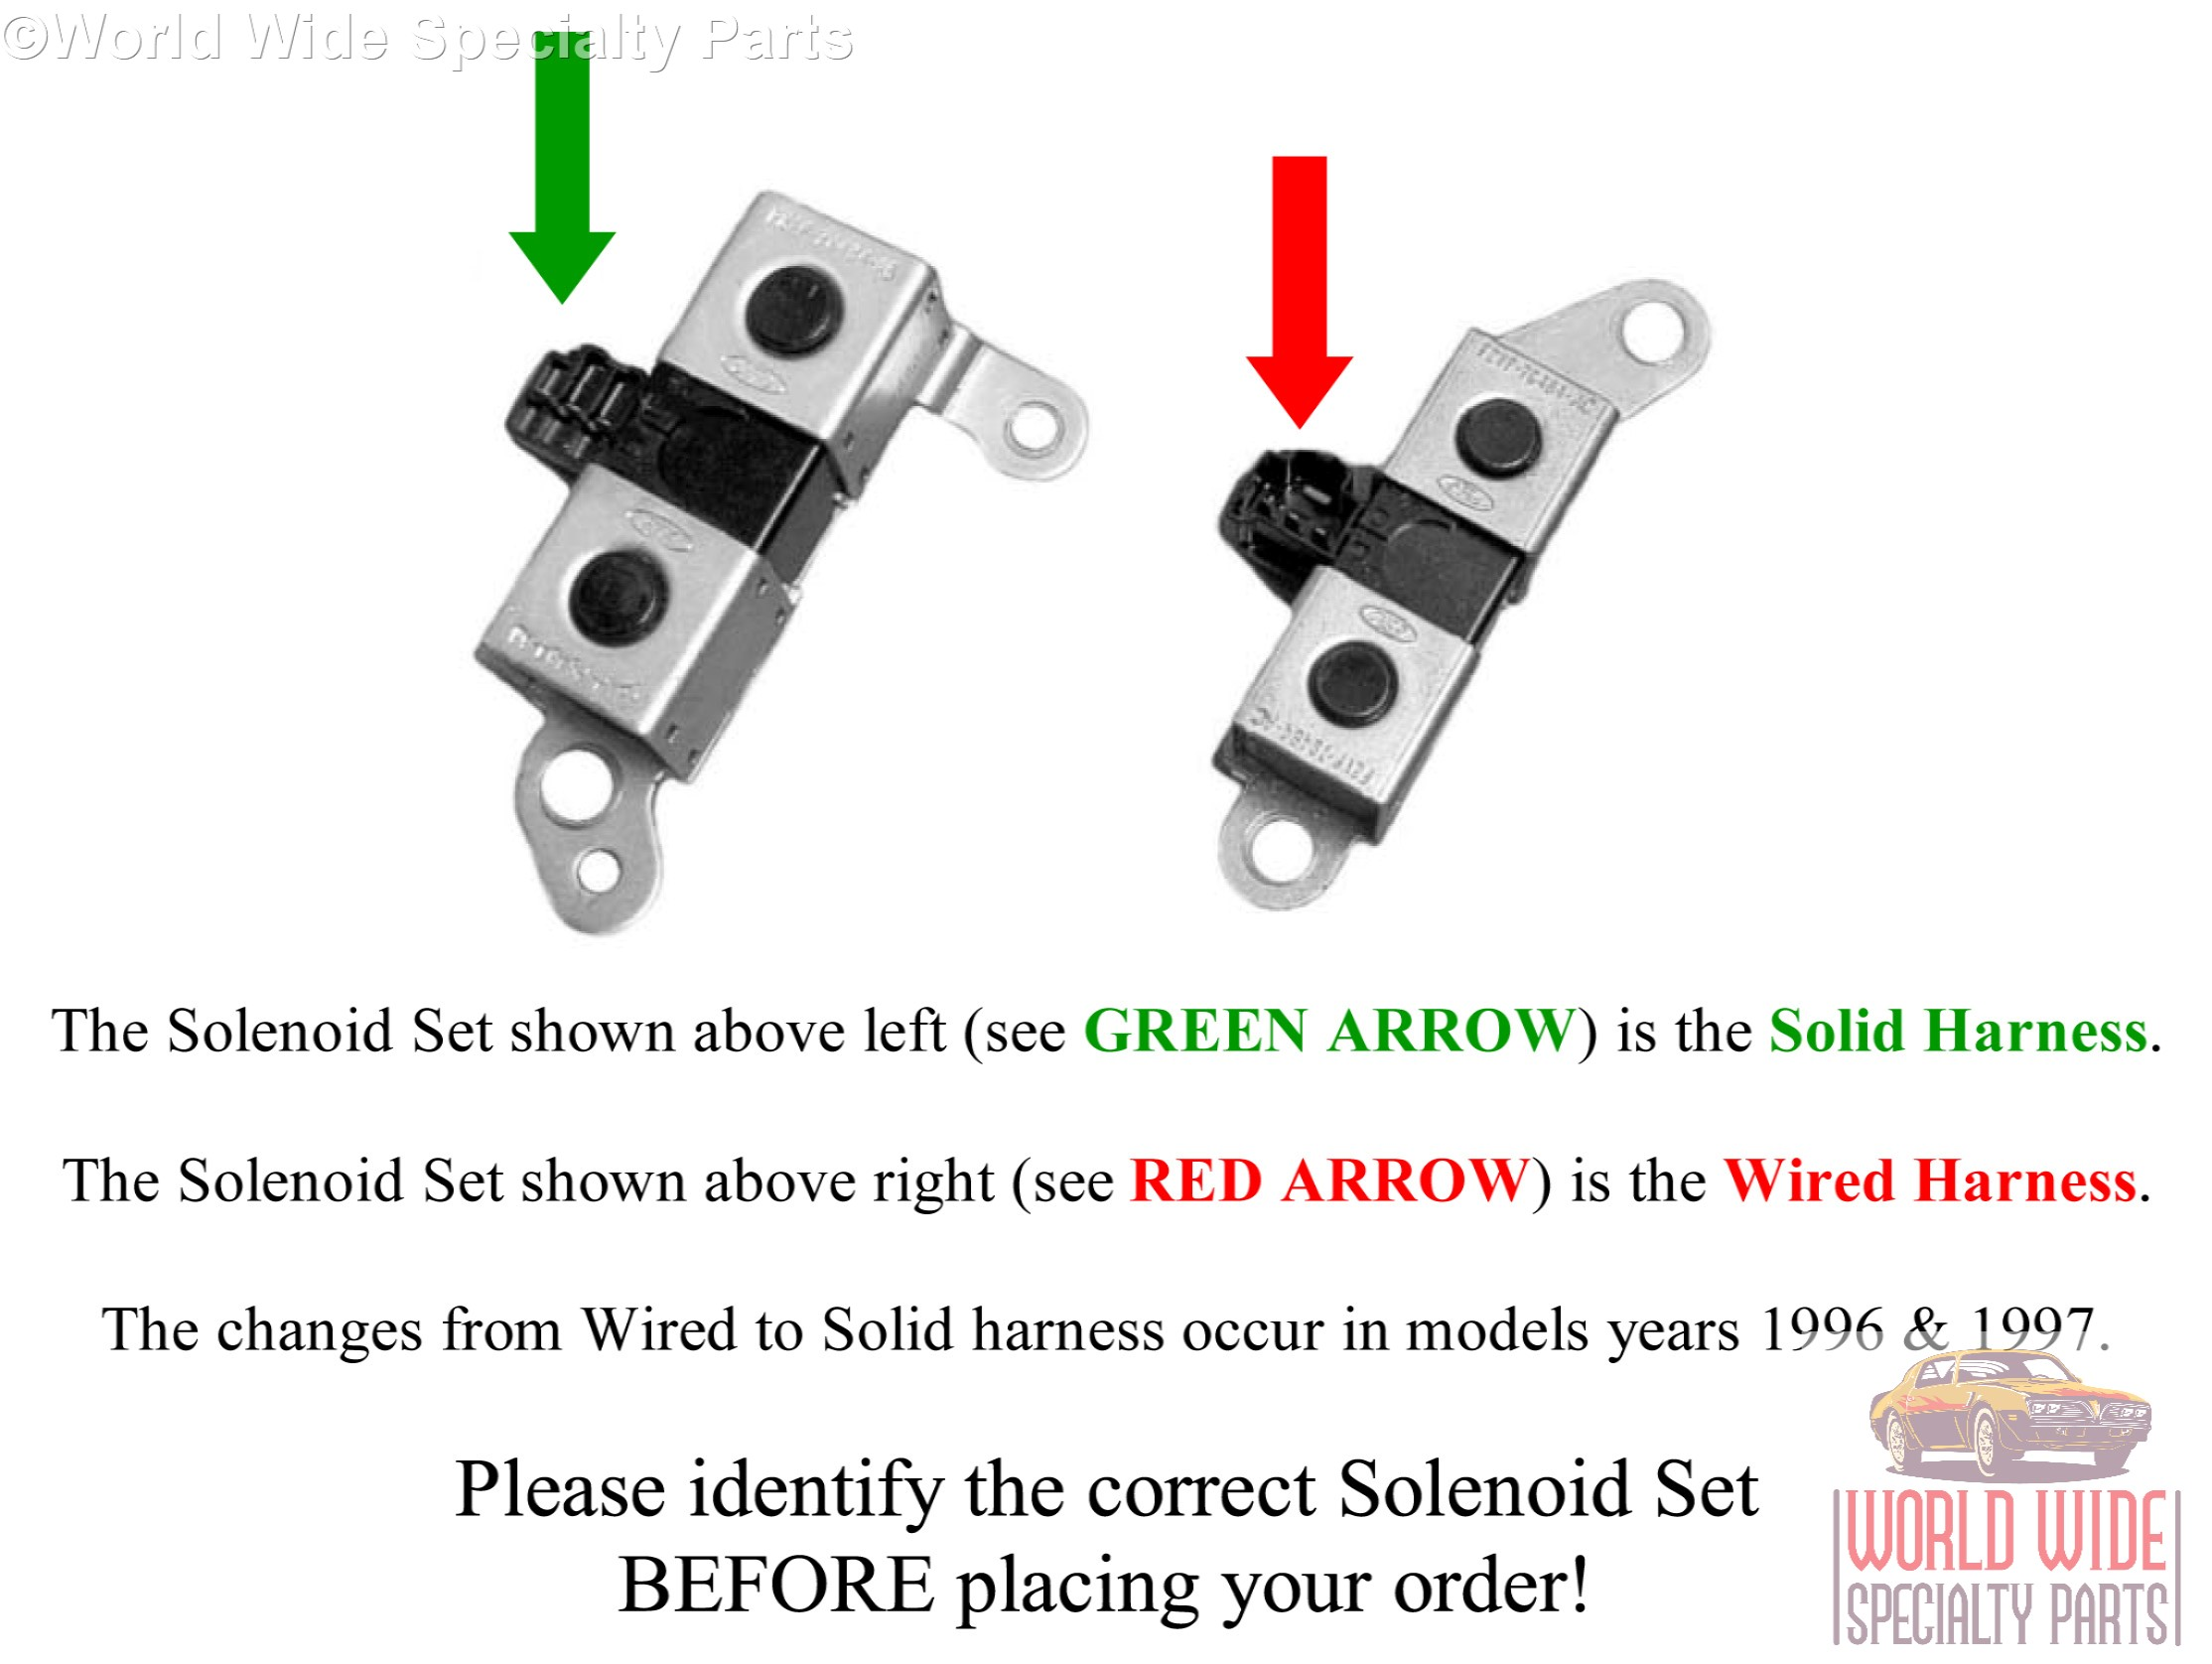 5r110 Wiring Diagram Ford 4r70w Harness Oil Pan 4x4 Transmission